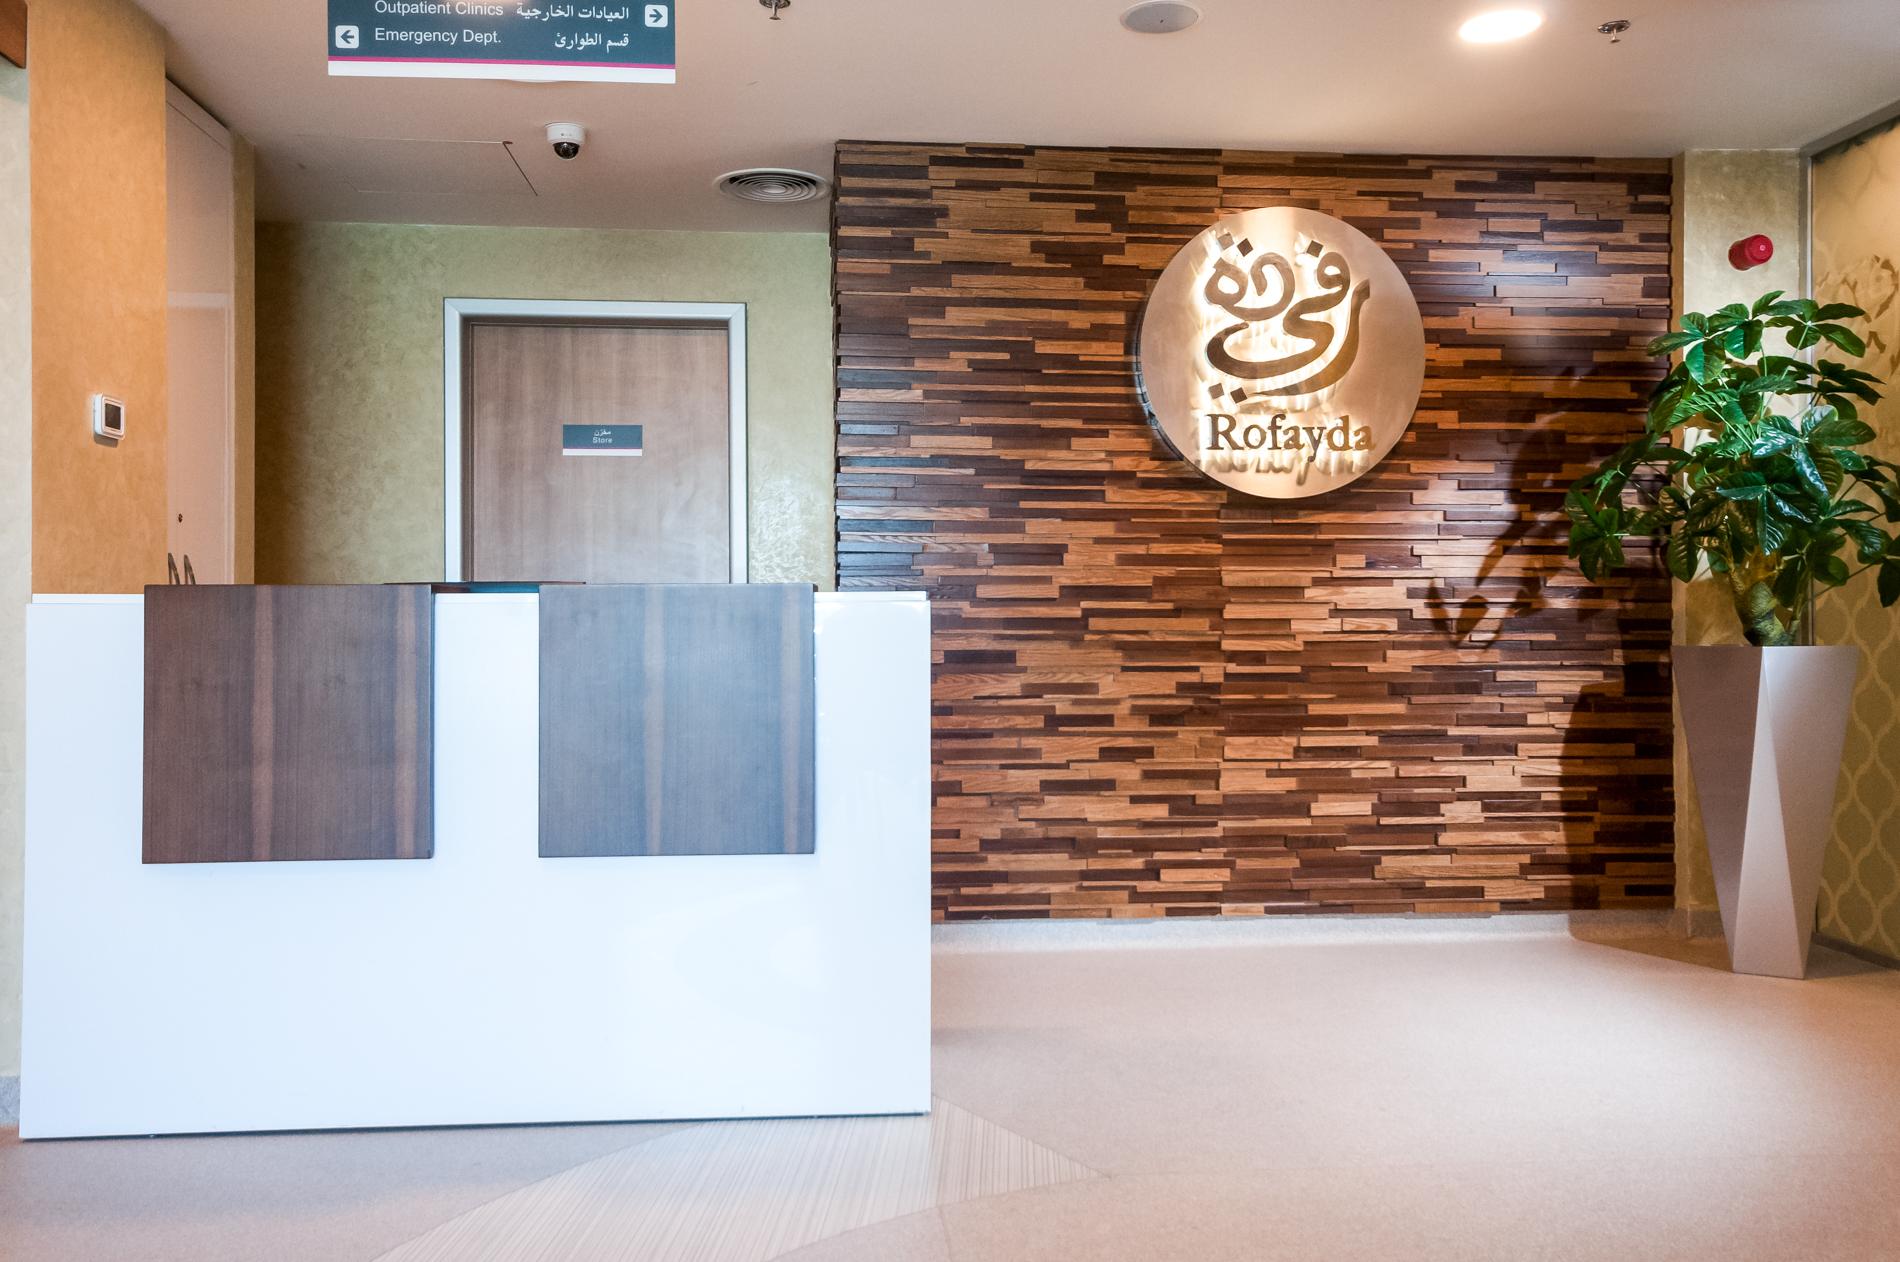 Rofayda Health Park - product 1